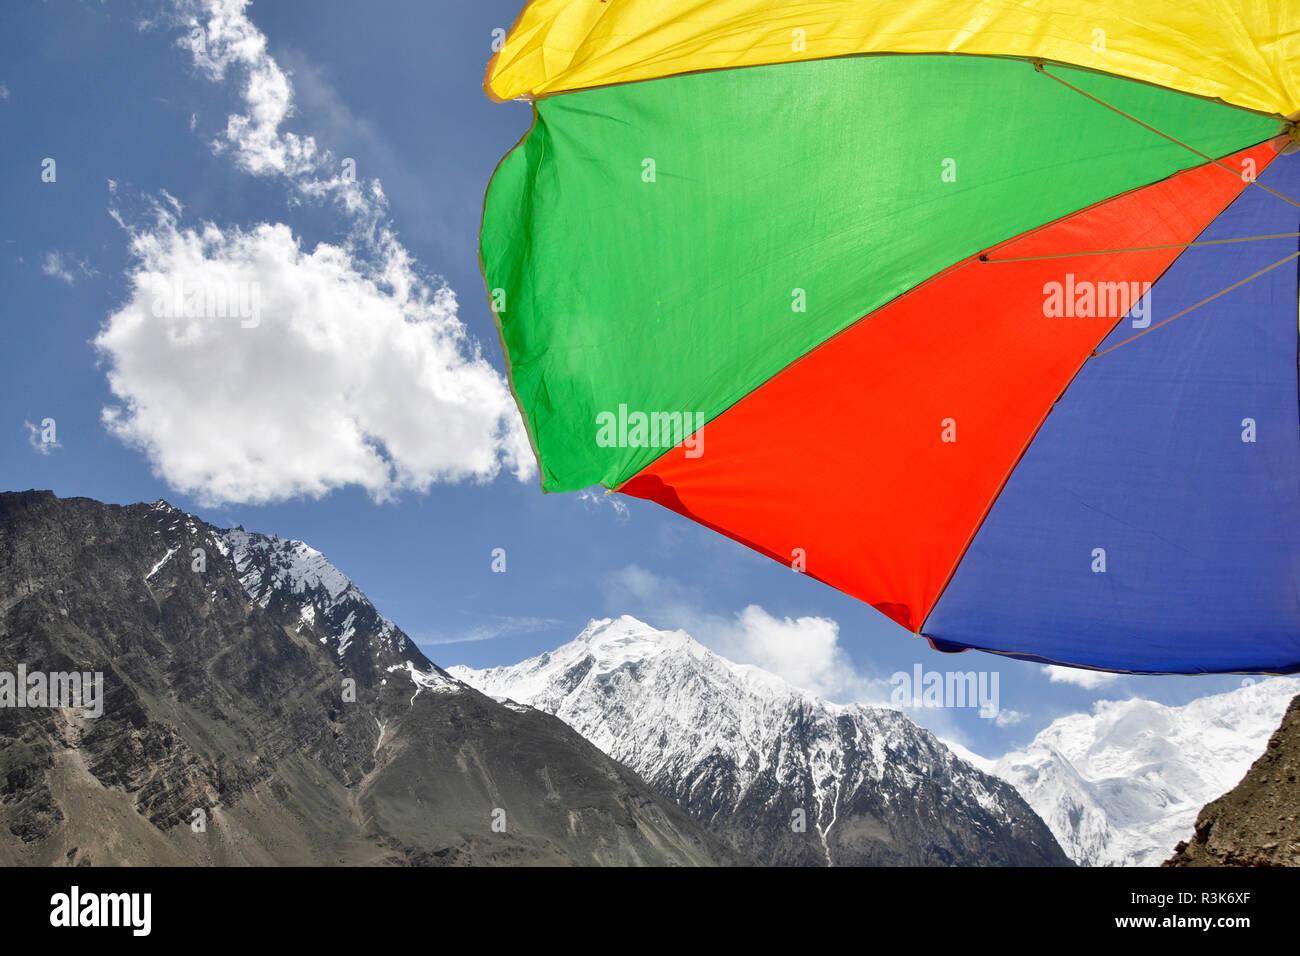 Pakistan, Nagar valley, landscape - Stock Image